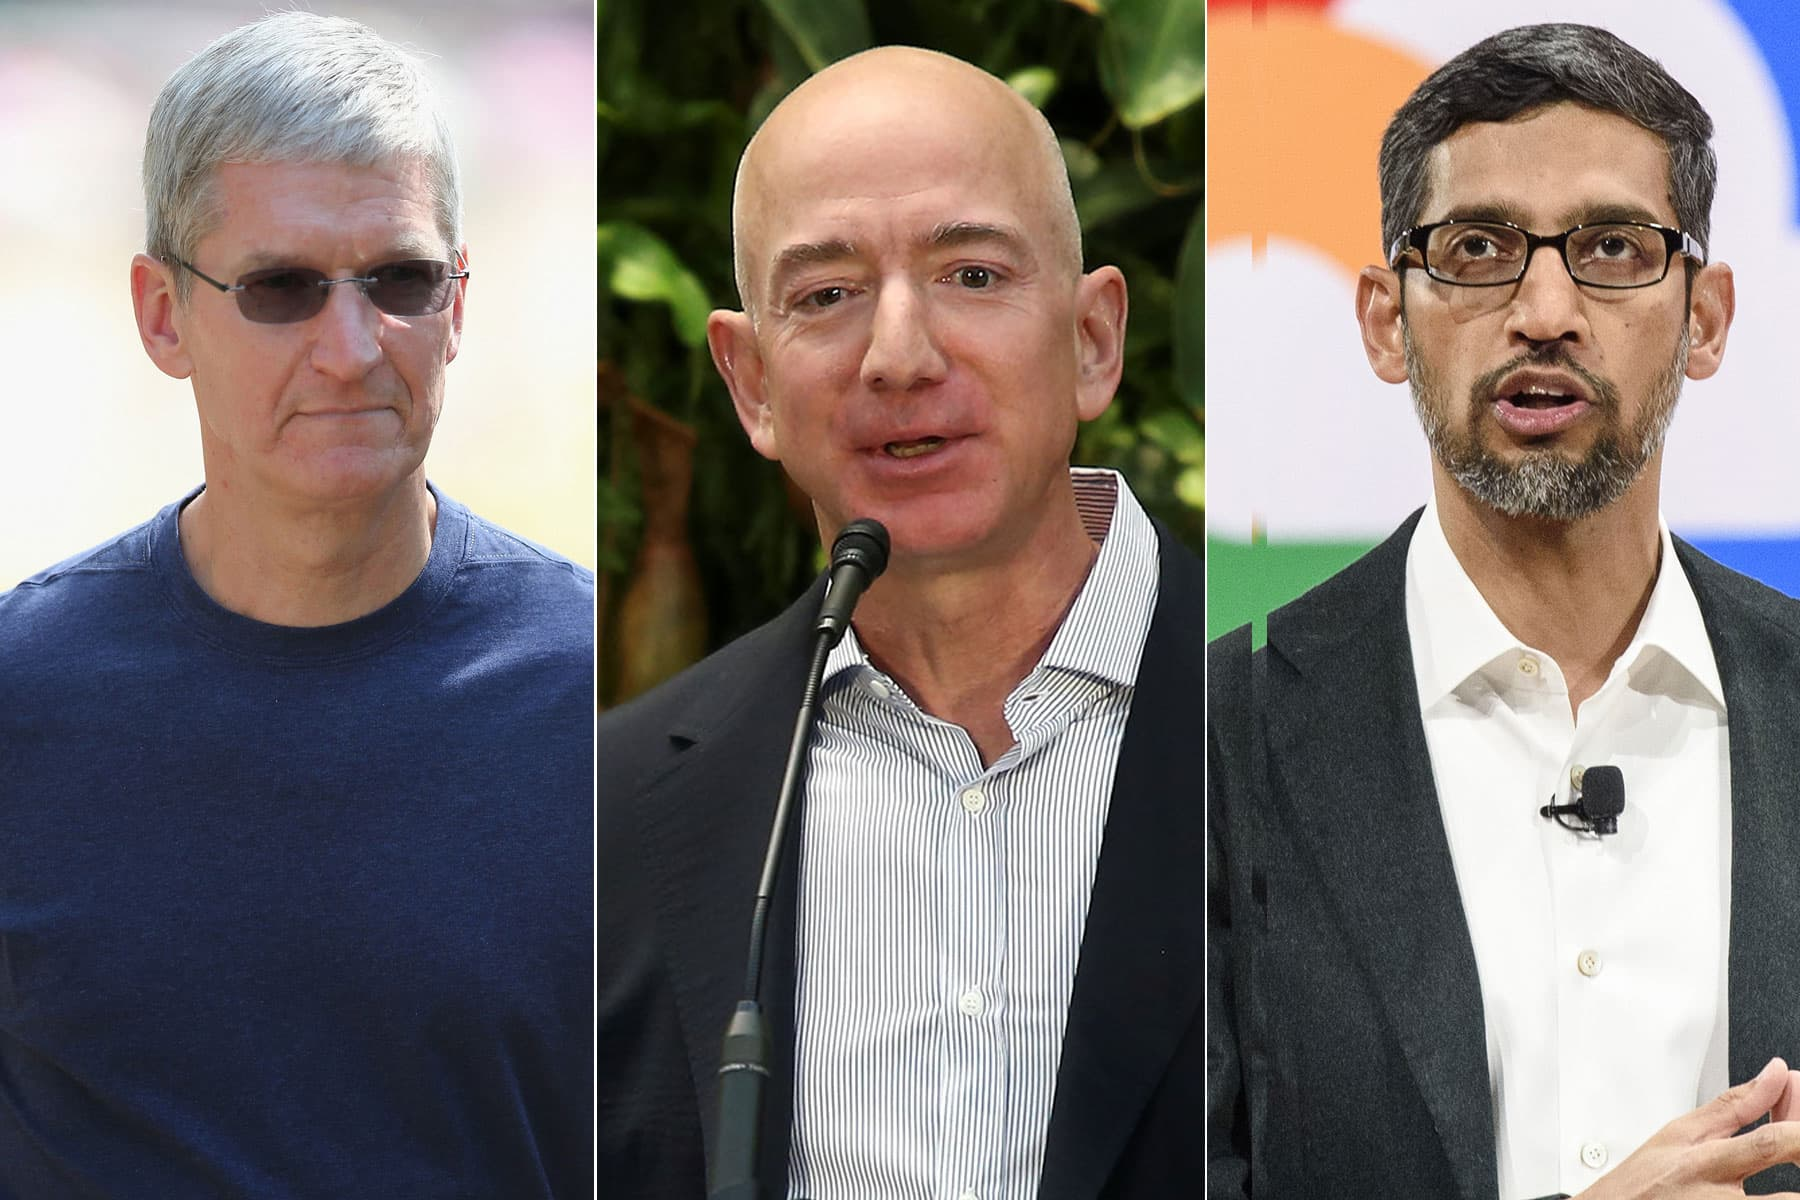 Amazon, Apple, Facebook and Google targeted in bipartisan antitrust reform bills